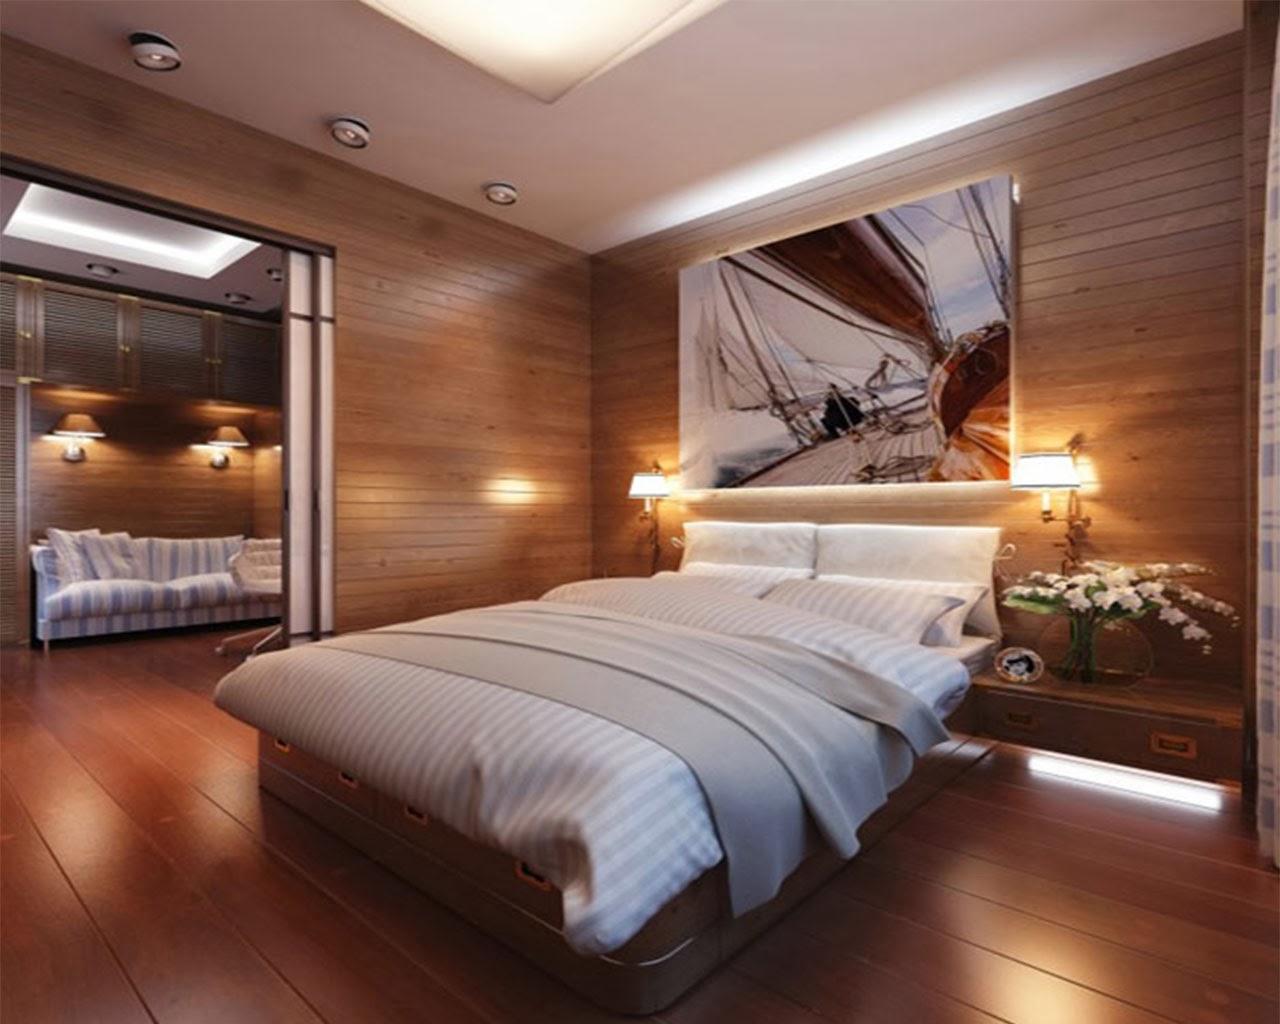 Bedroom Designs 2014 - Moi Tres Jolie on Bedroom Decor  id=93812